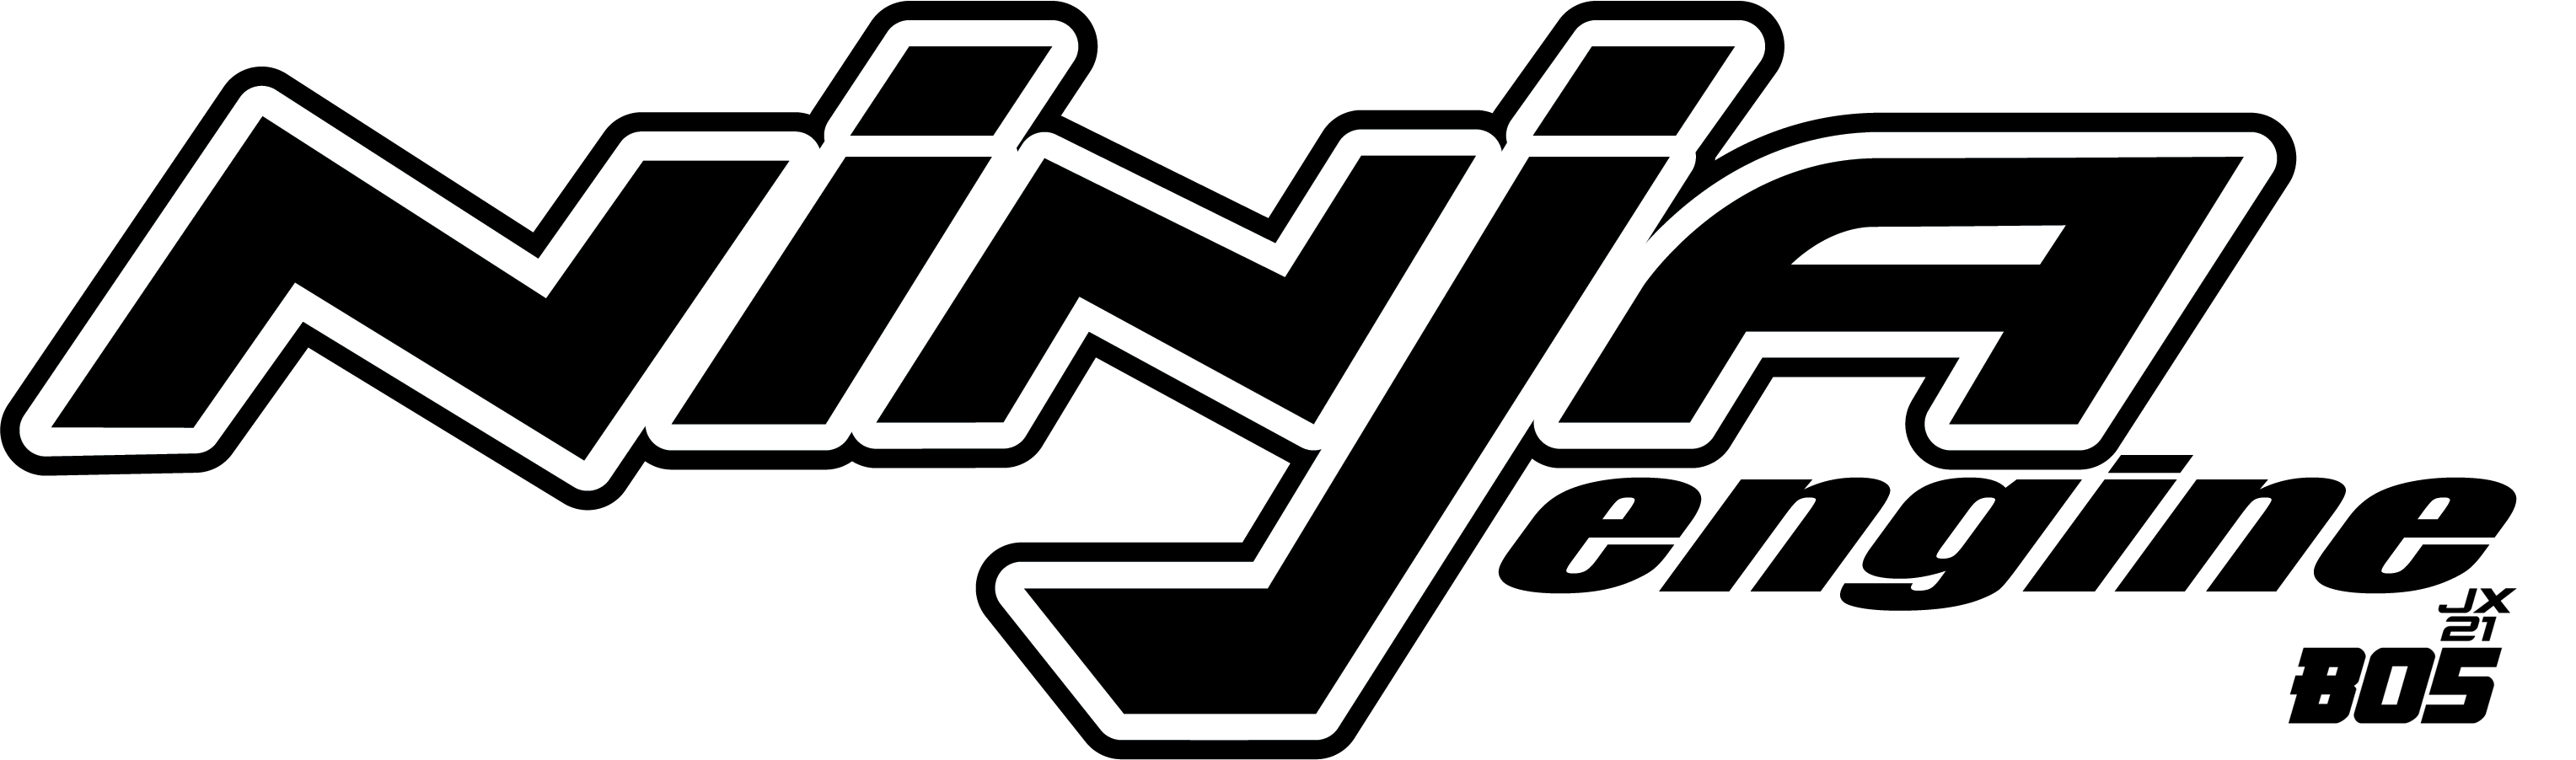 ninja-logo-copy.png